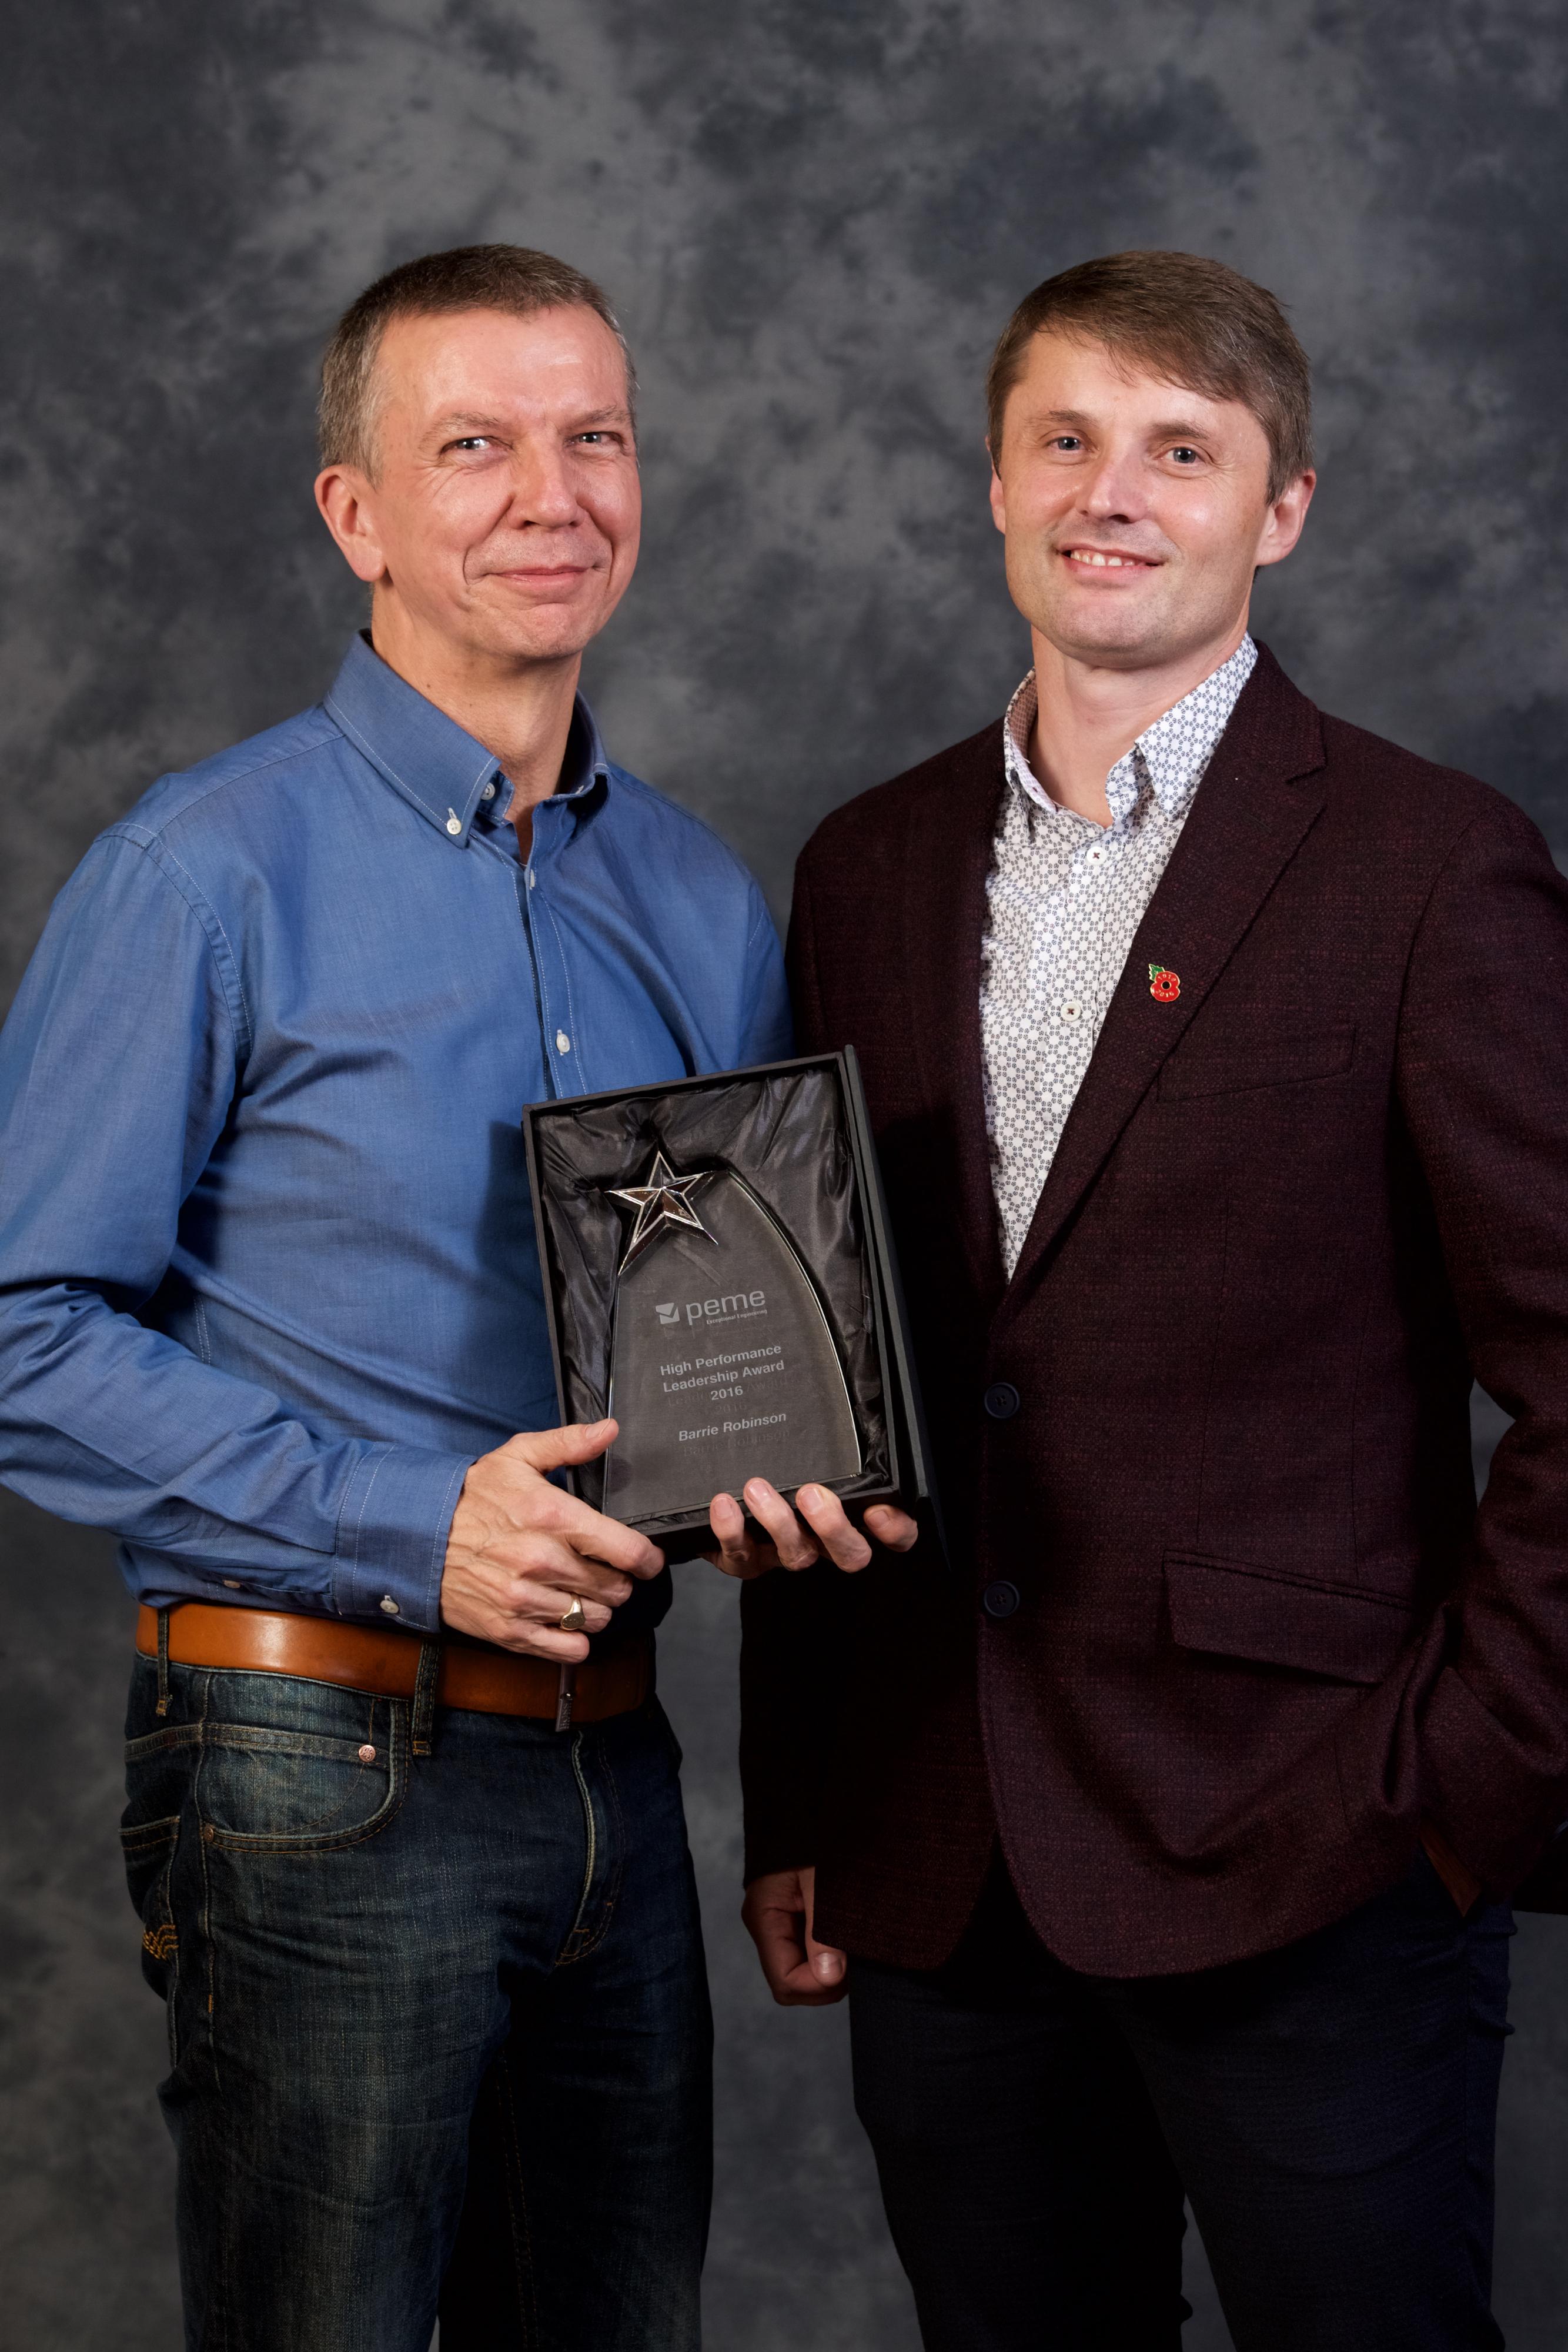 peme-barrie-robinson-award